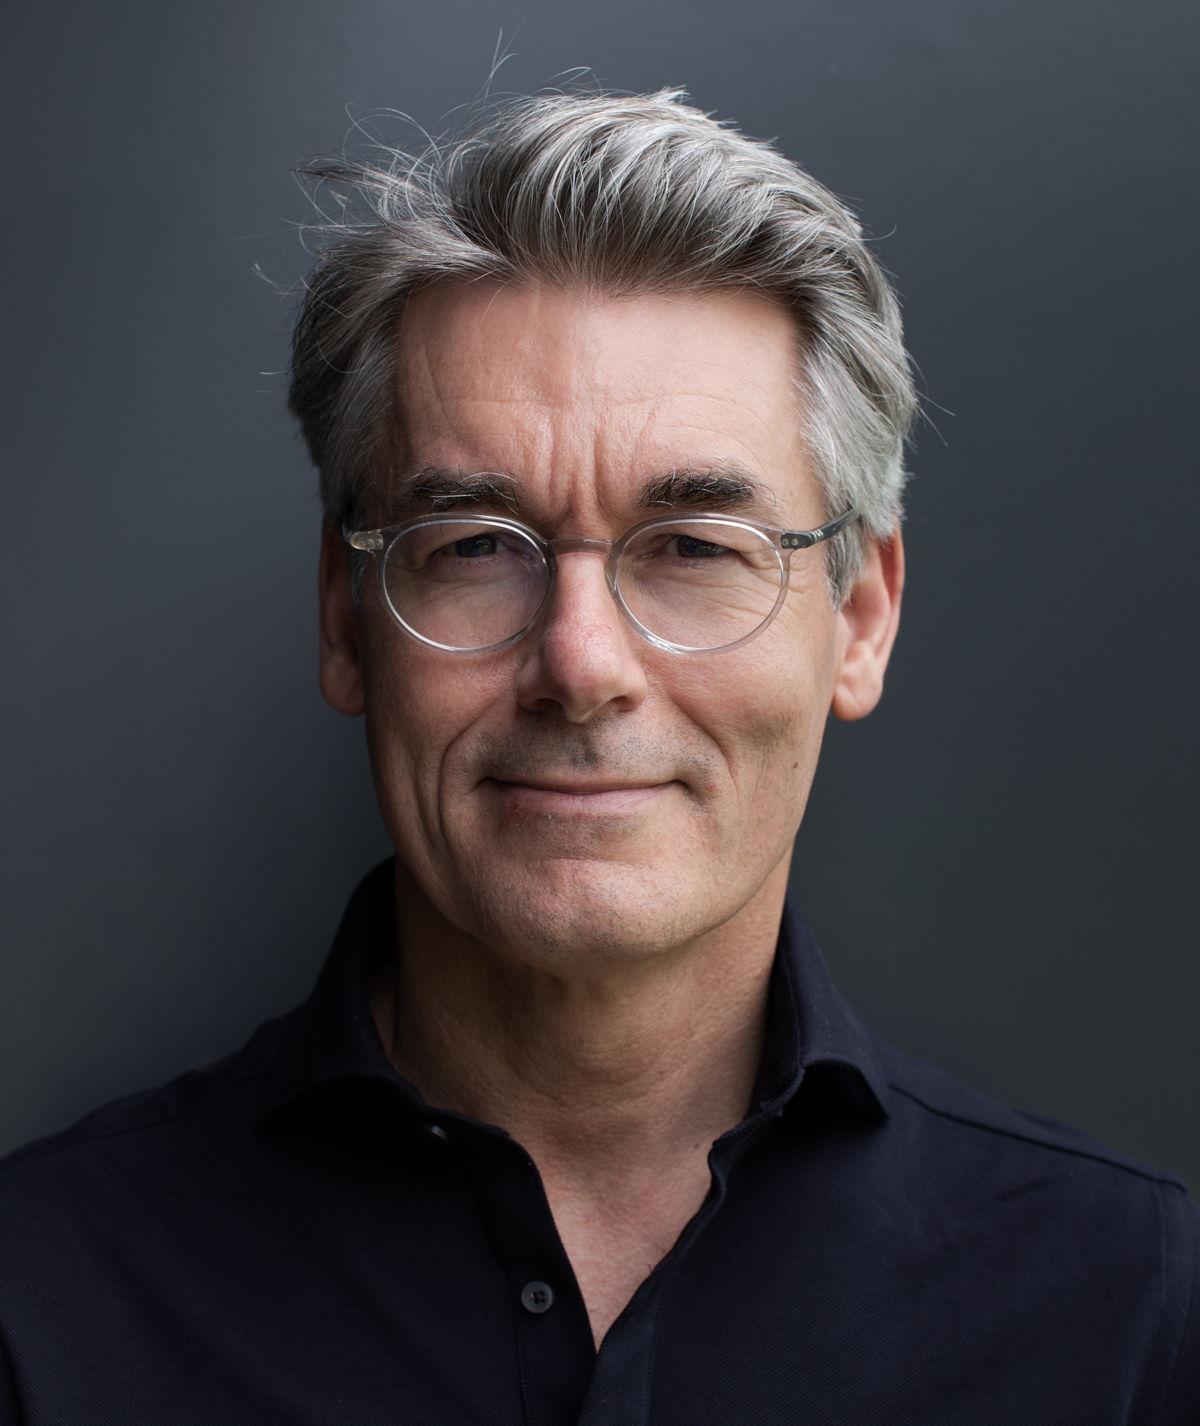 Ron Holtdijk wird neuer Director Business Communication bei Sennheiser